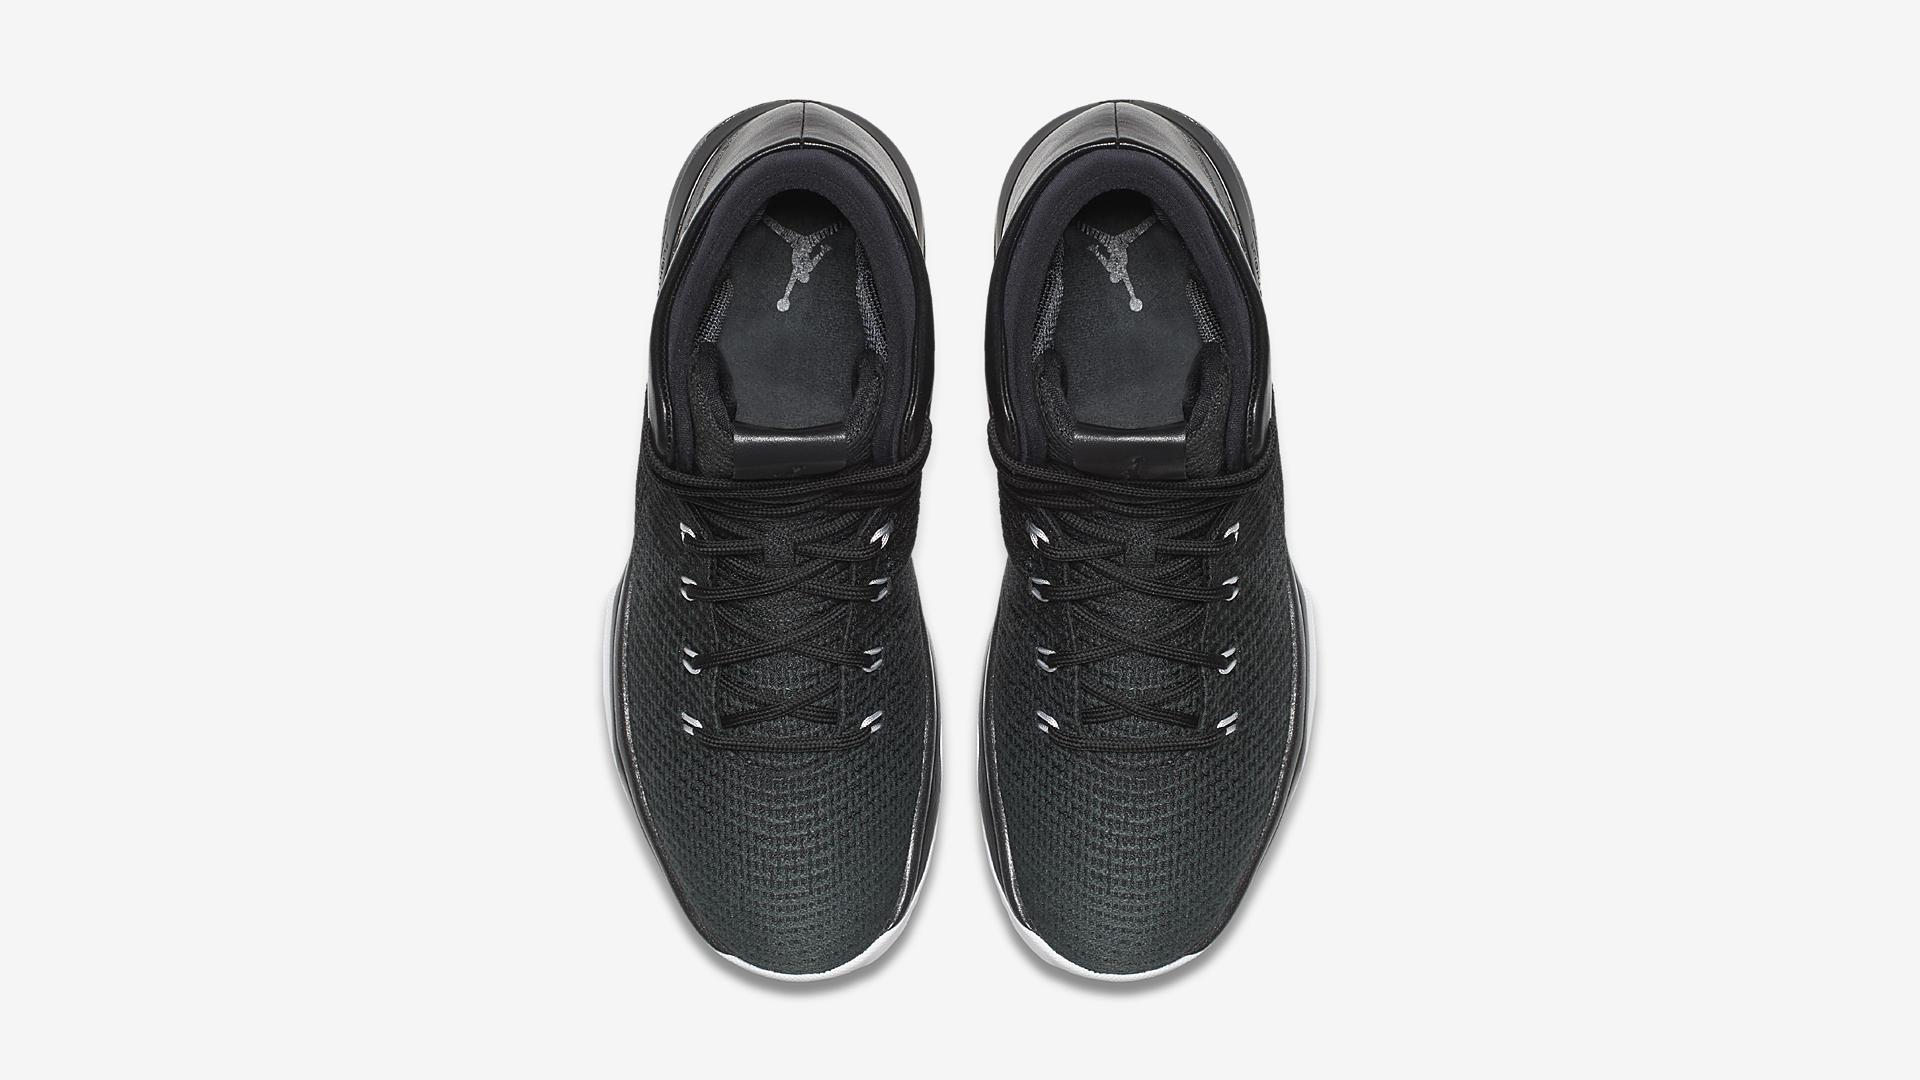 Air Jordan 31 Black Cat 845037 010 3